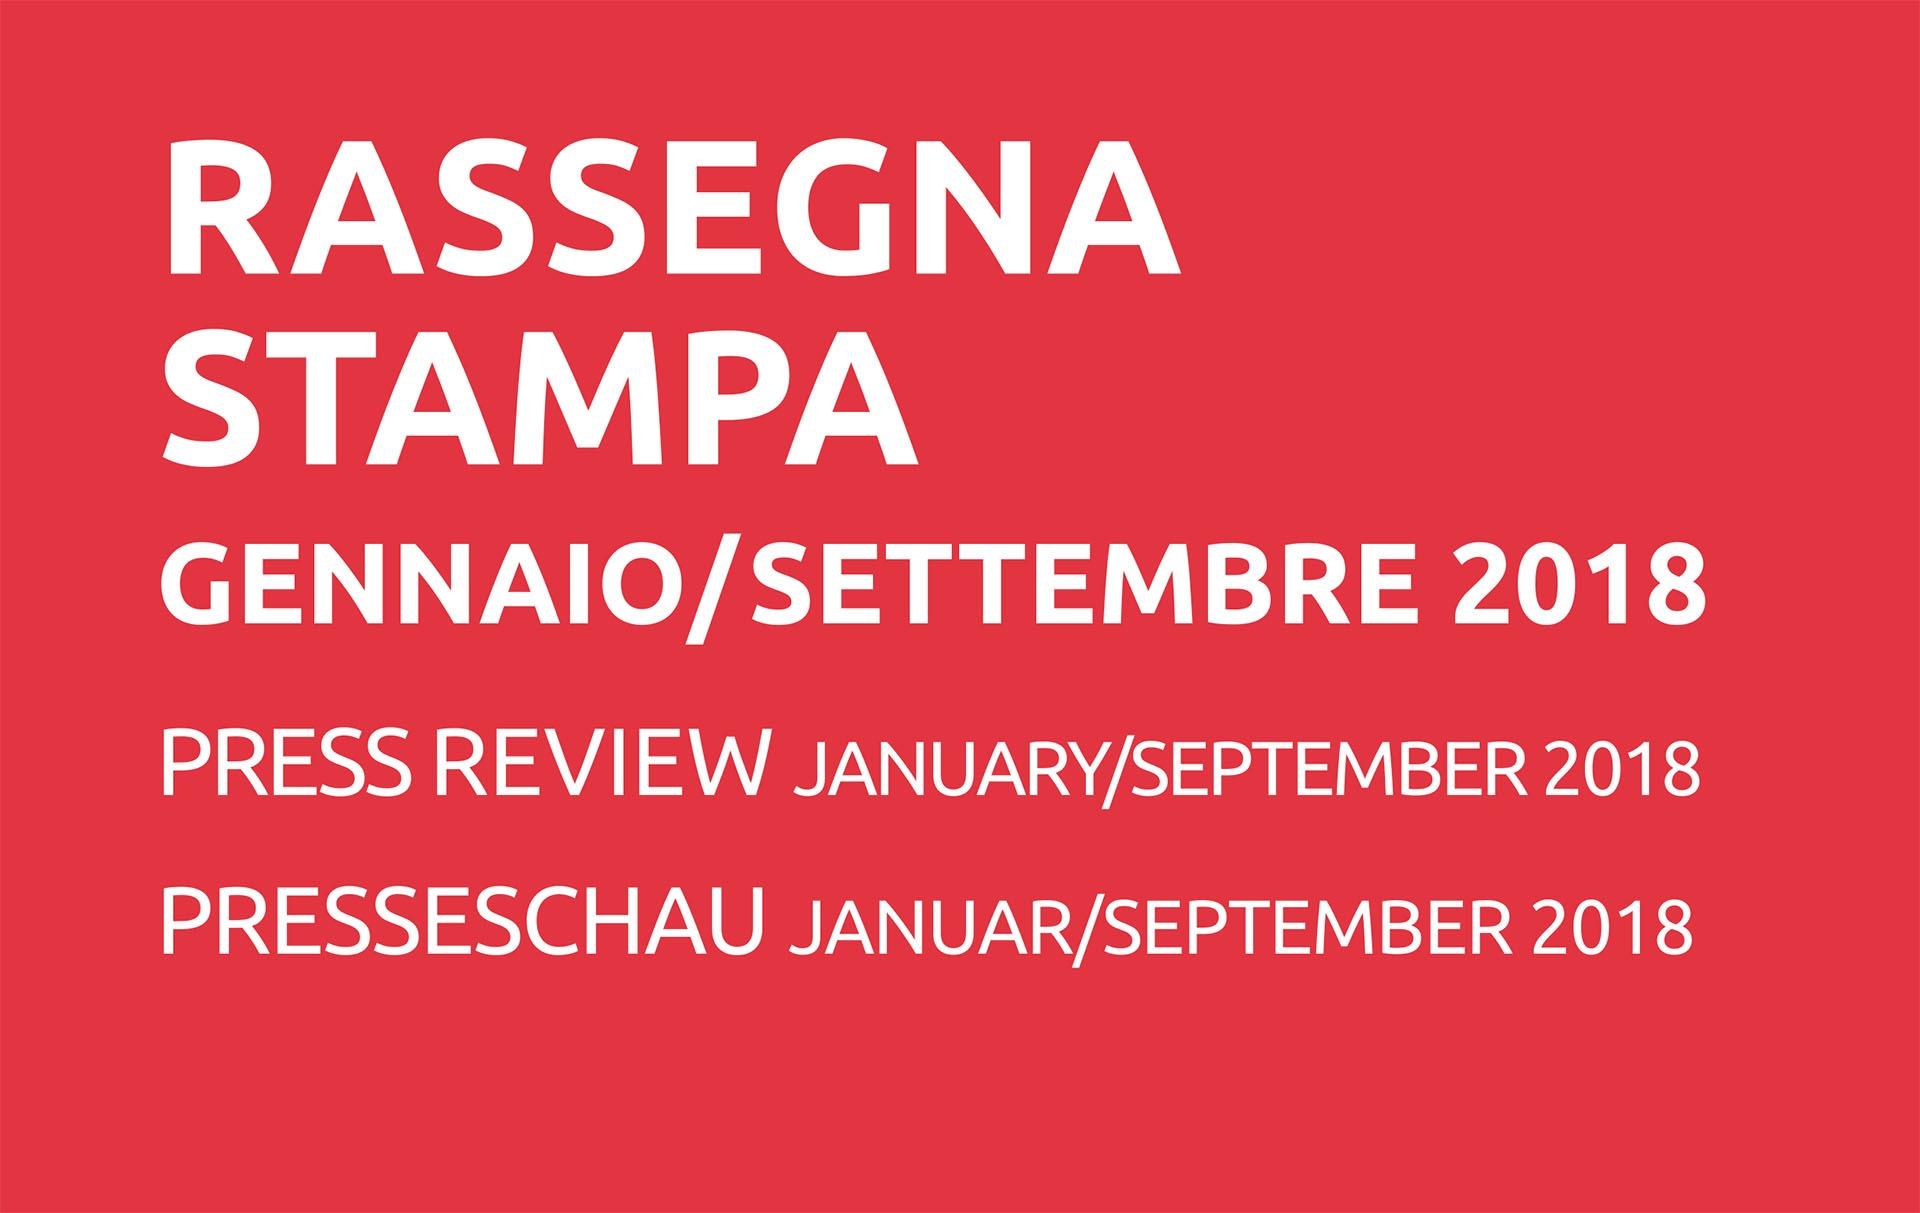 sapa-rassegna-stampa-2018